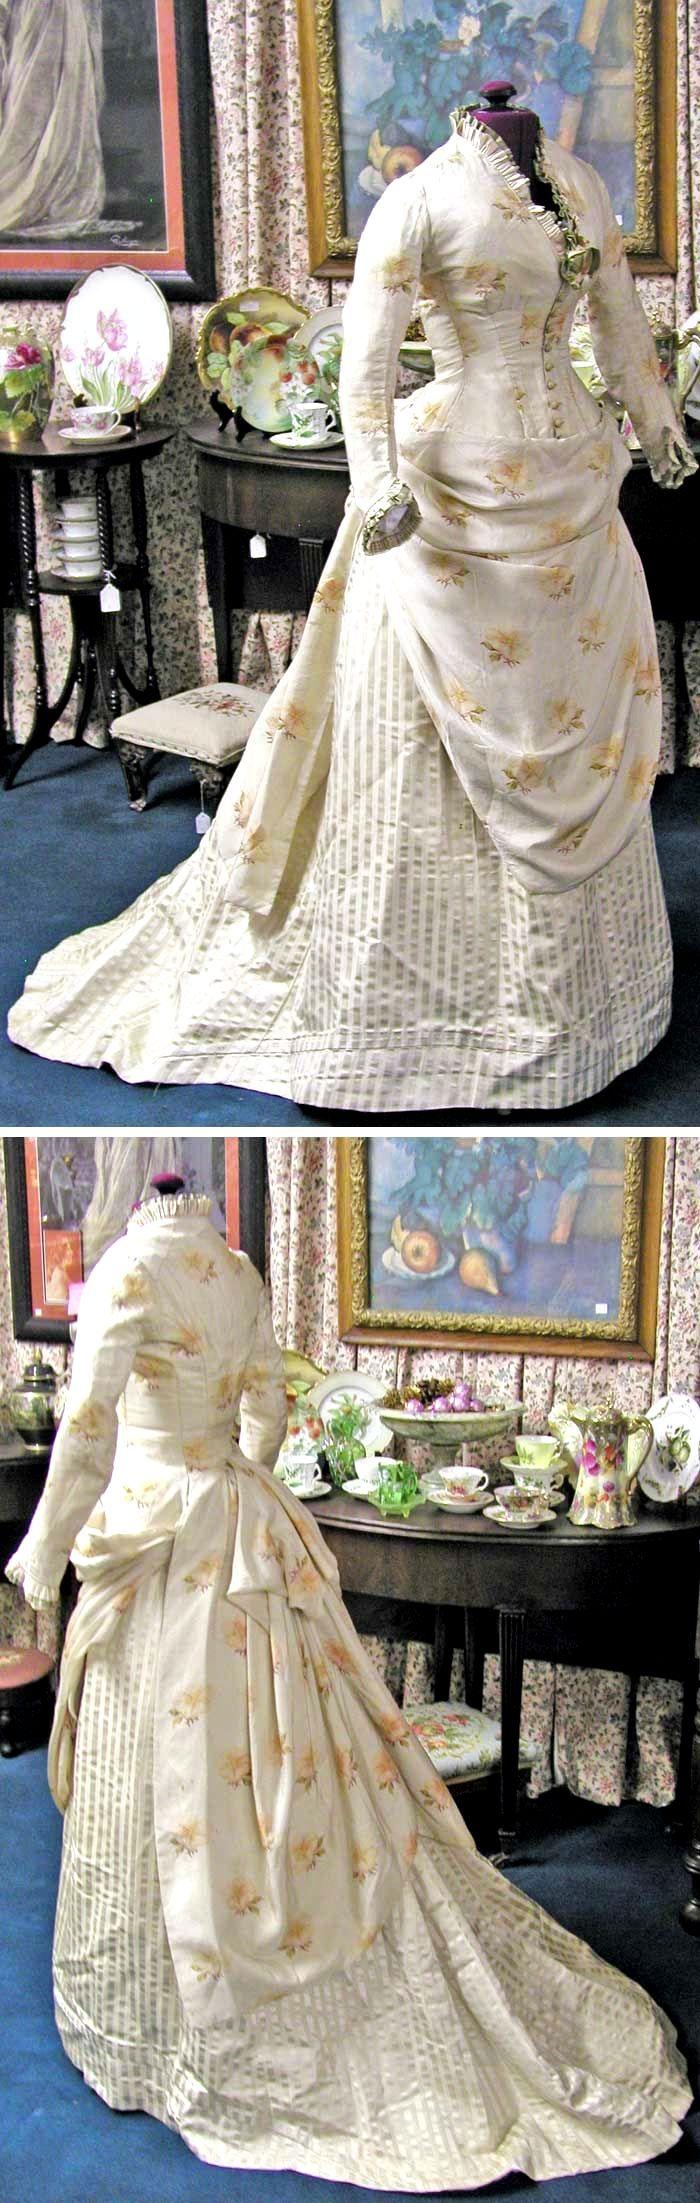 HISTORICAL WHITE & PRINTED DRESSES